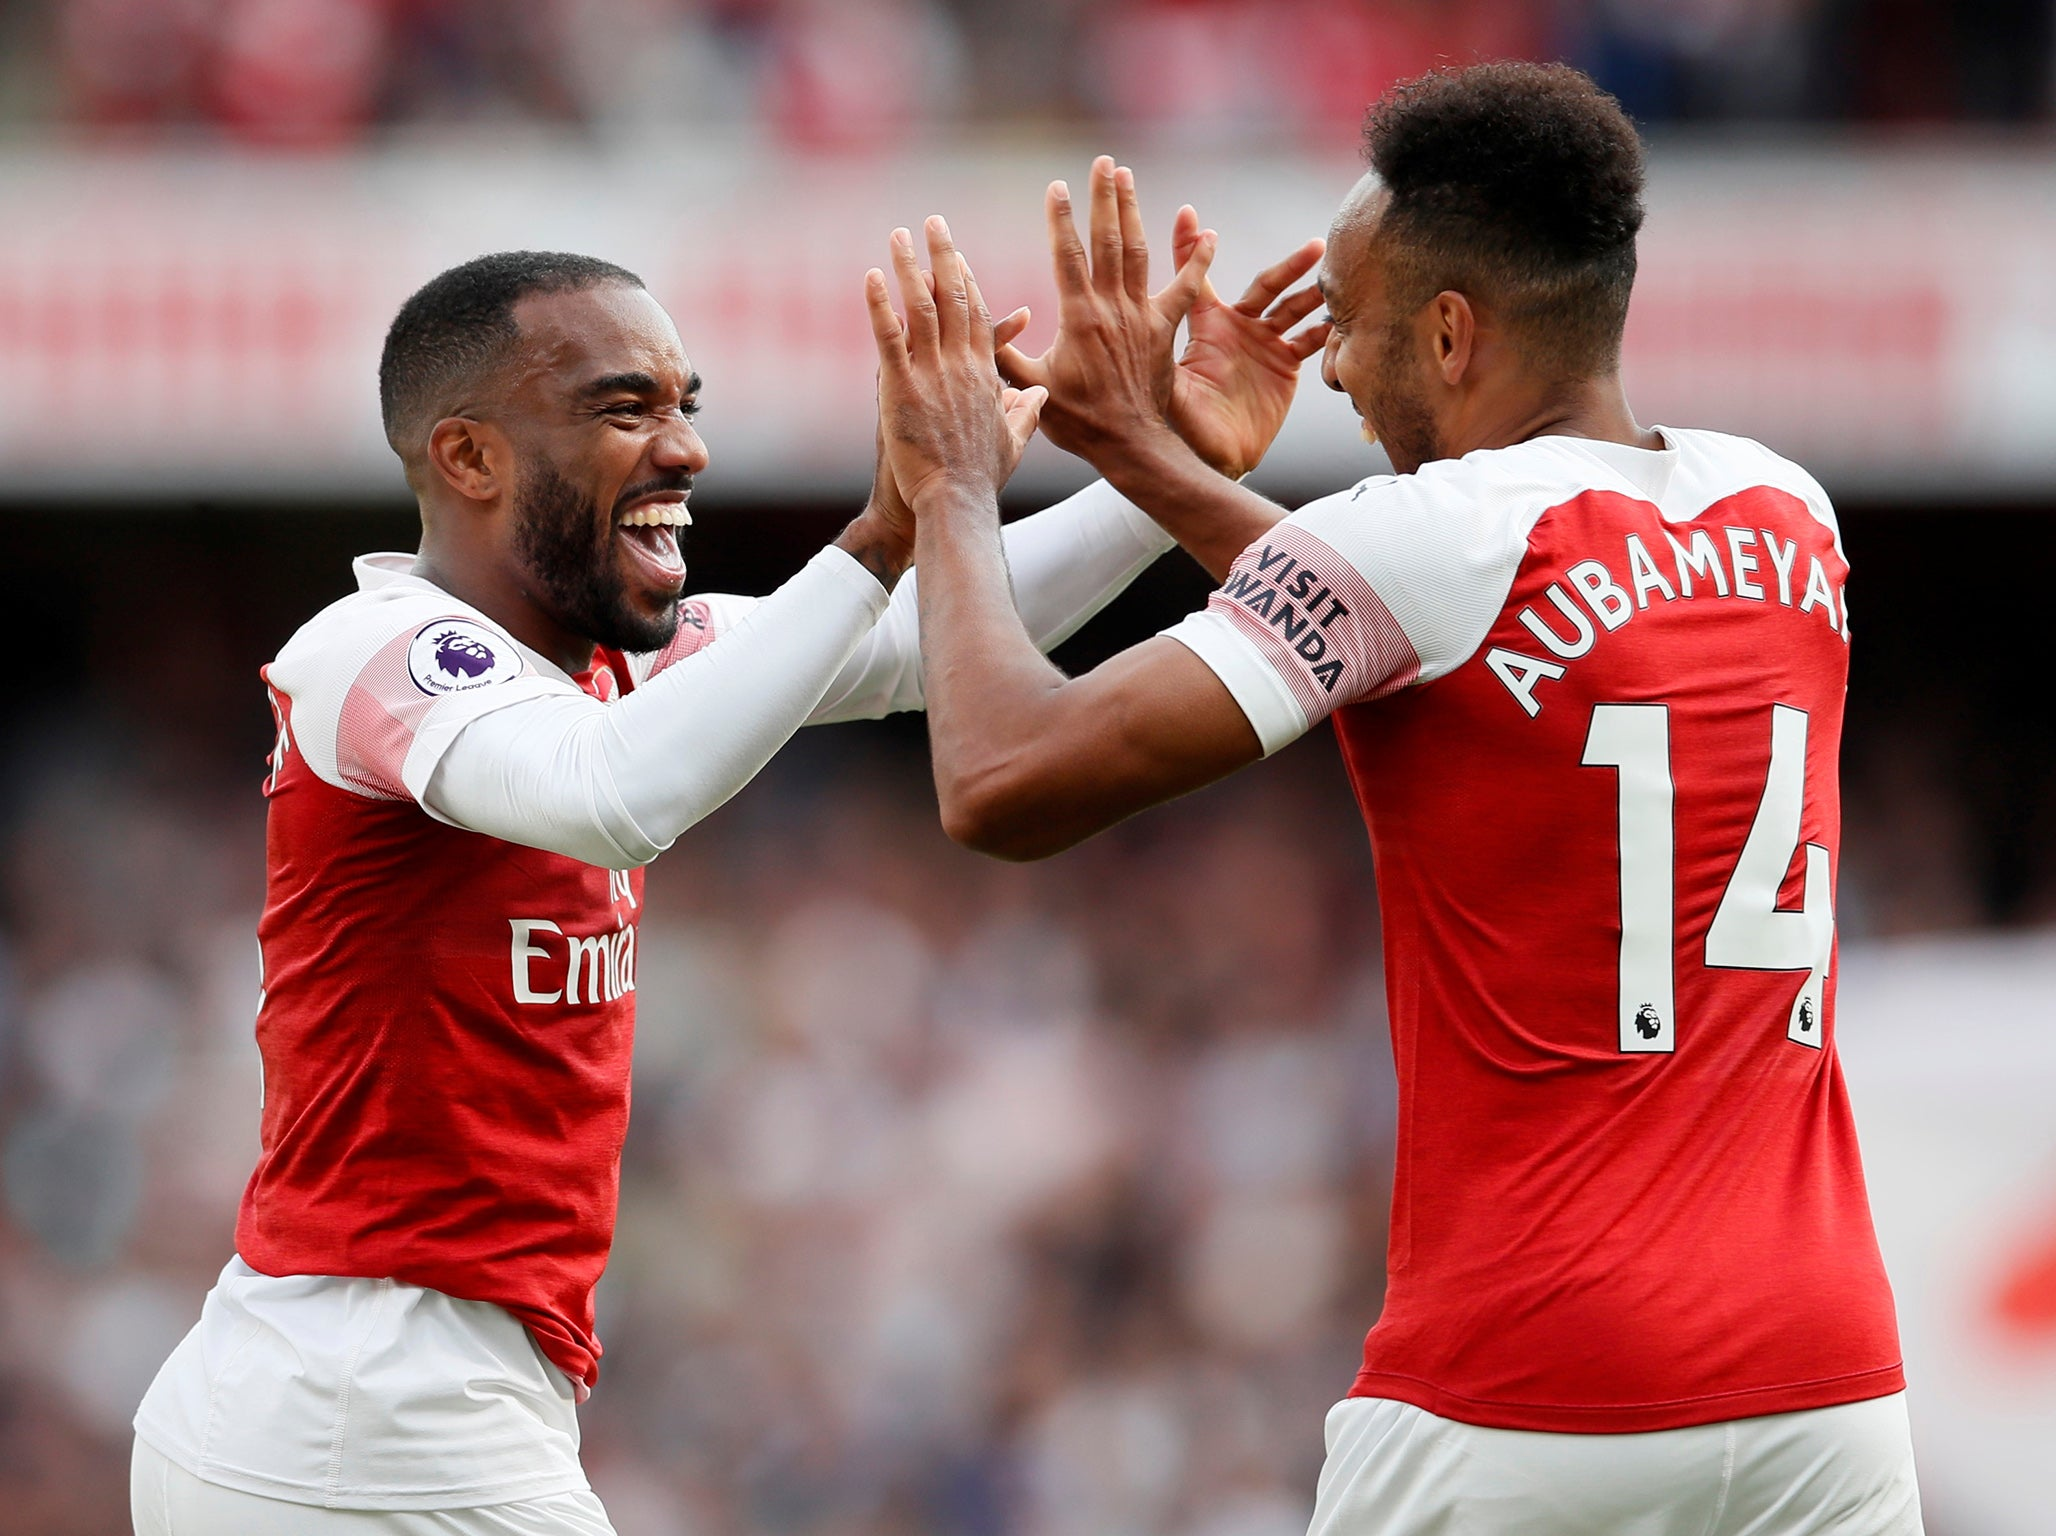 Arsenal's Alexandre Lacazette Seizes His Chance To